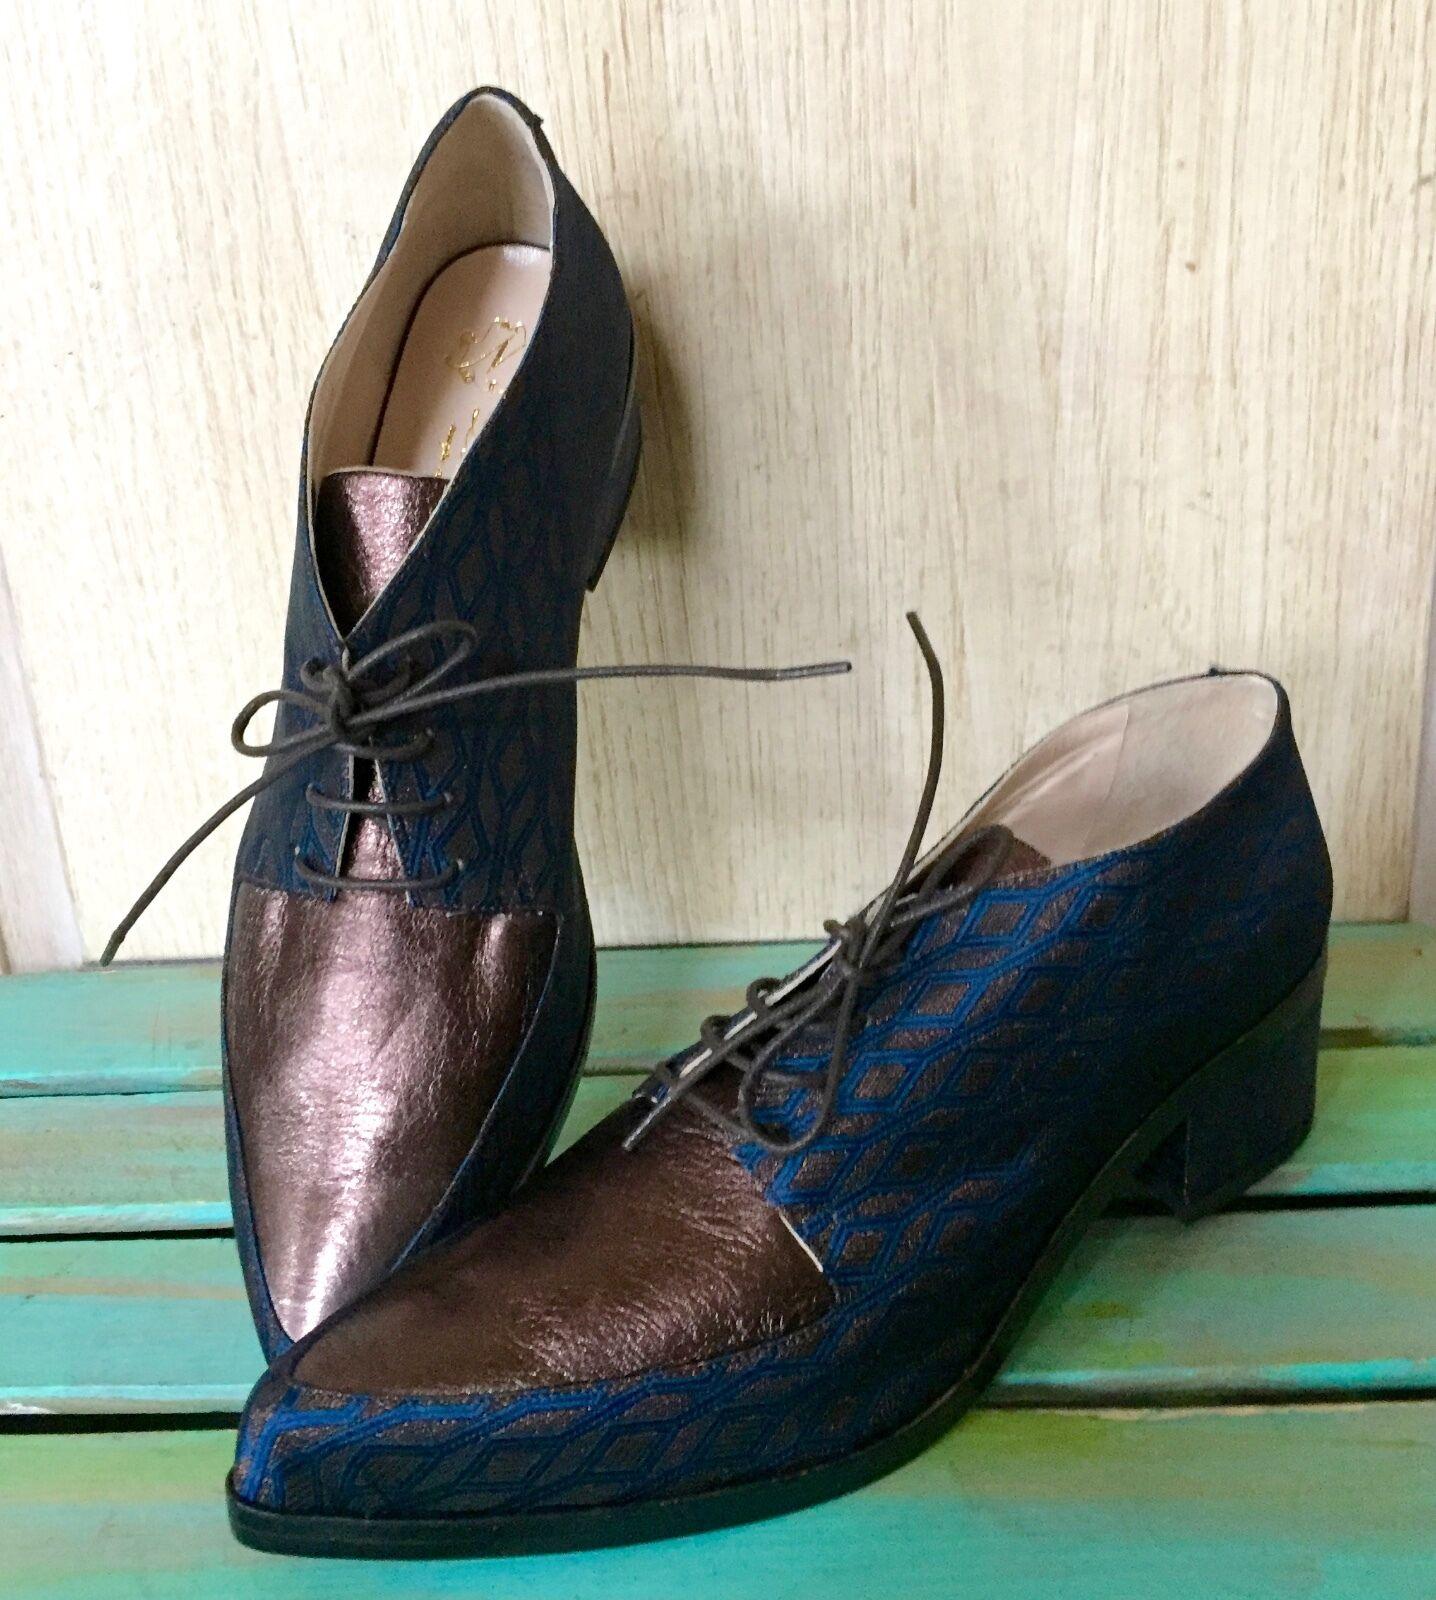 NIB Lenora Blau Bronze Fabric Leather Lace Up Oxford schuhe 38